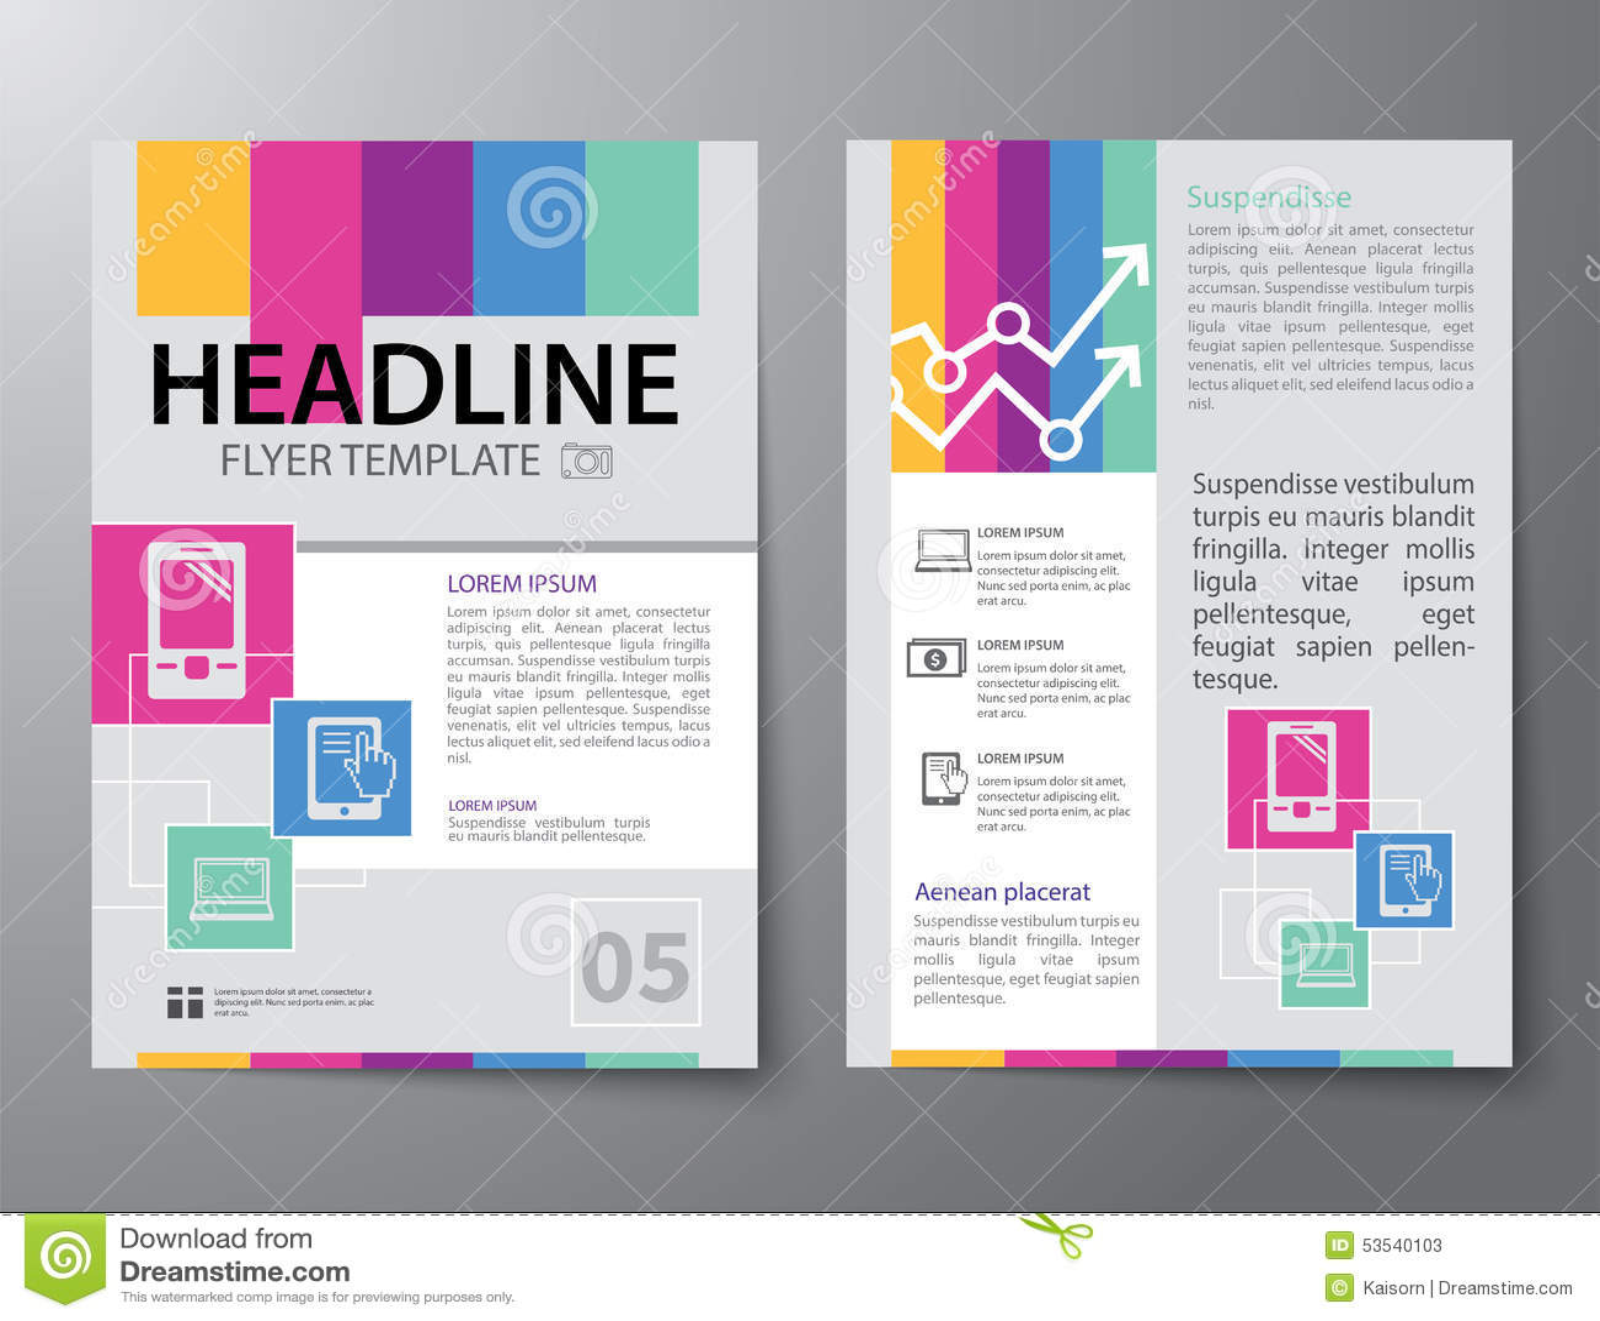 revista flyers - Timiz.conceptzmusic.co